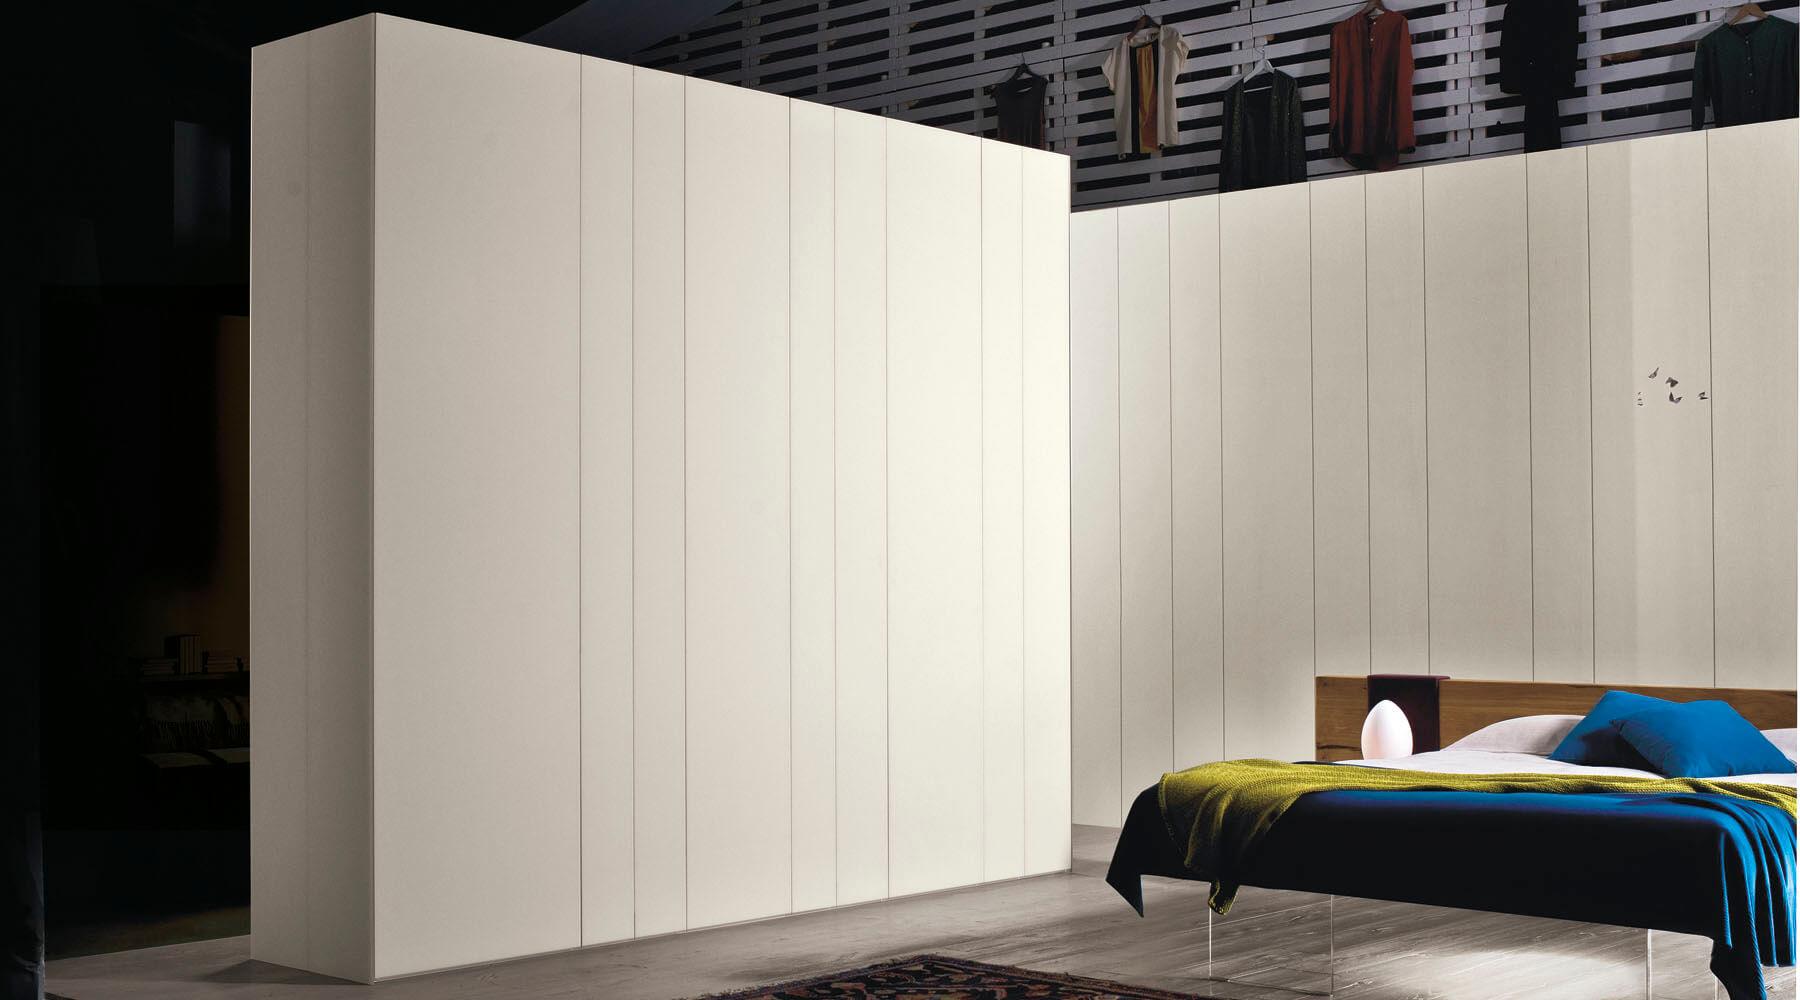 Striped wallpaper that seems like a wardrobe LAGO Design 1800x1000